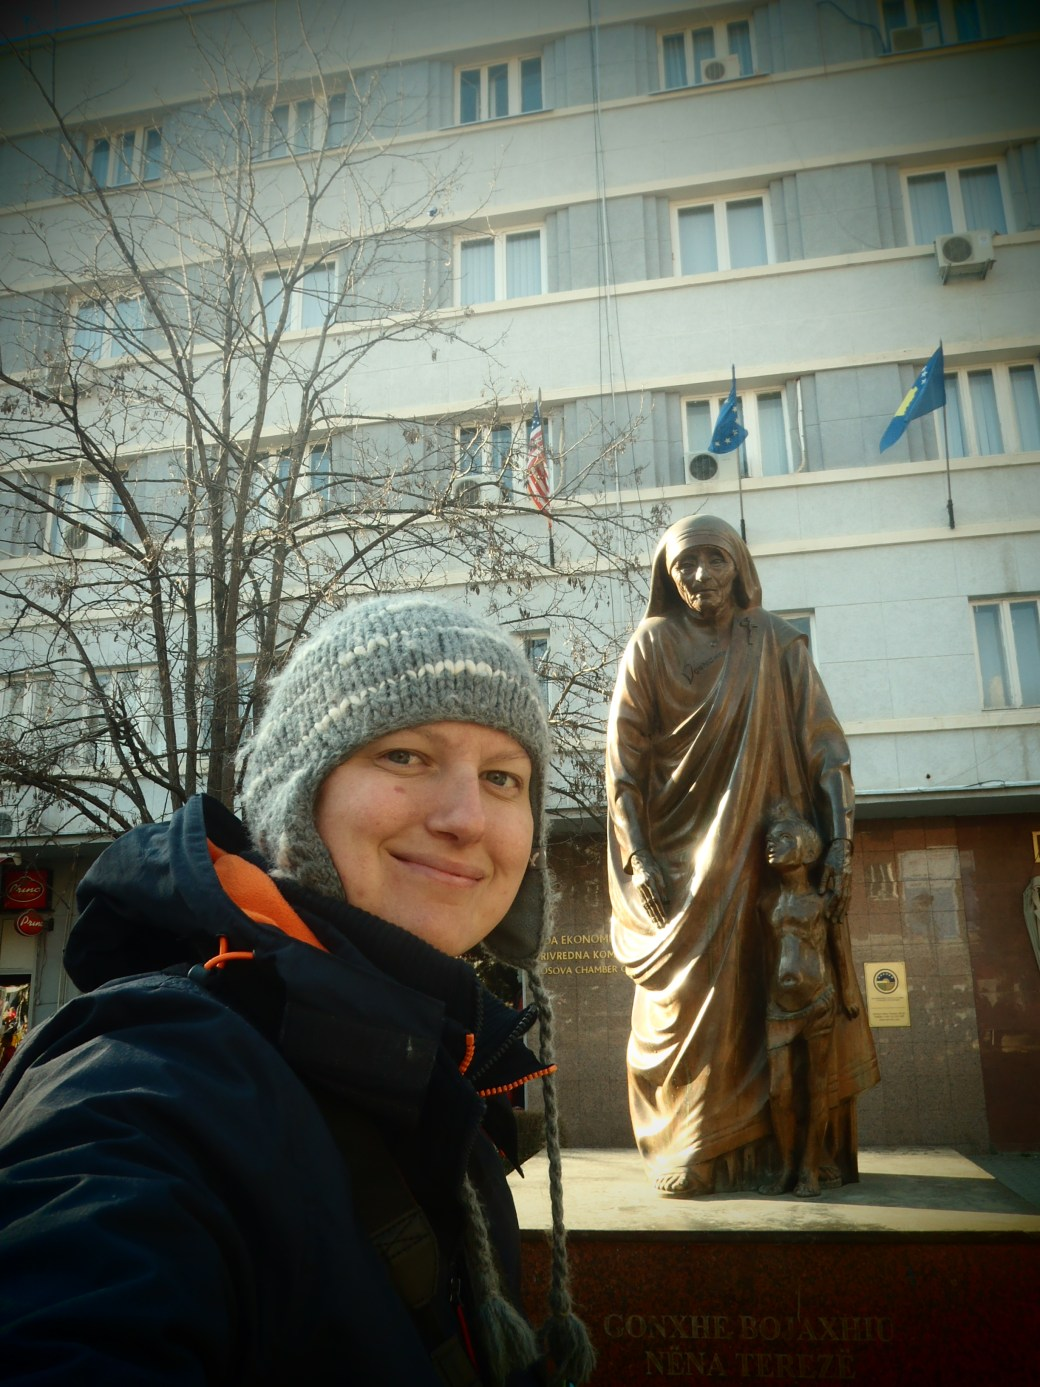 Mother Teresa and I; Pristina, Kosovo; 2013